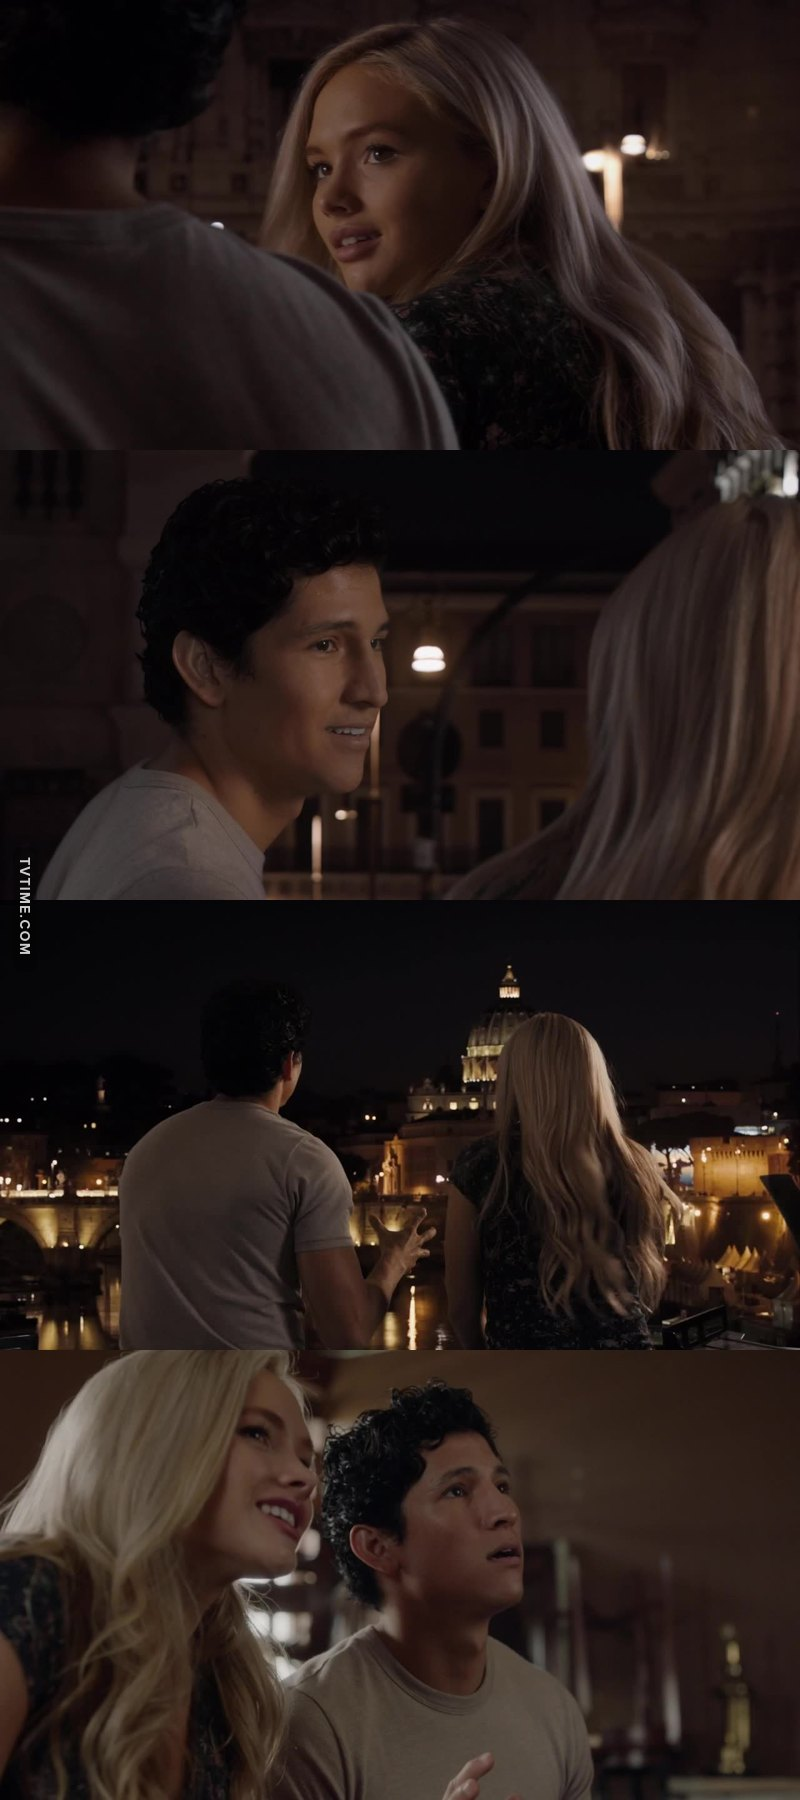 I just LOVE this scene